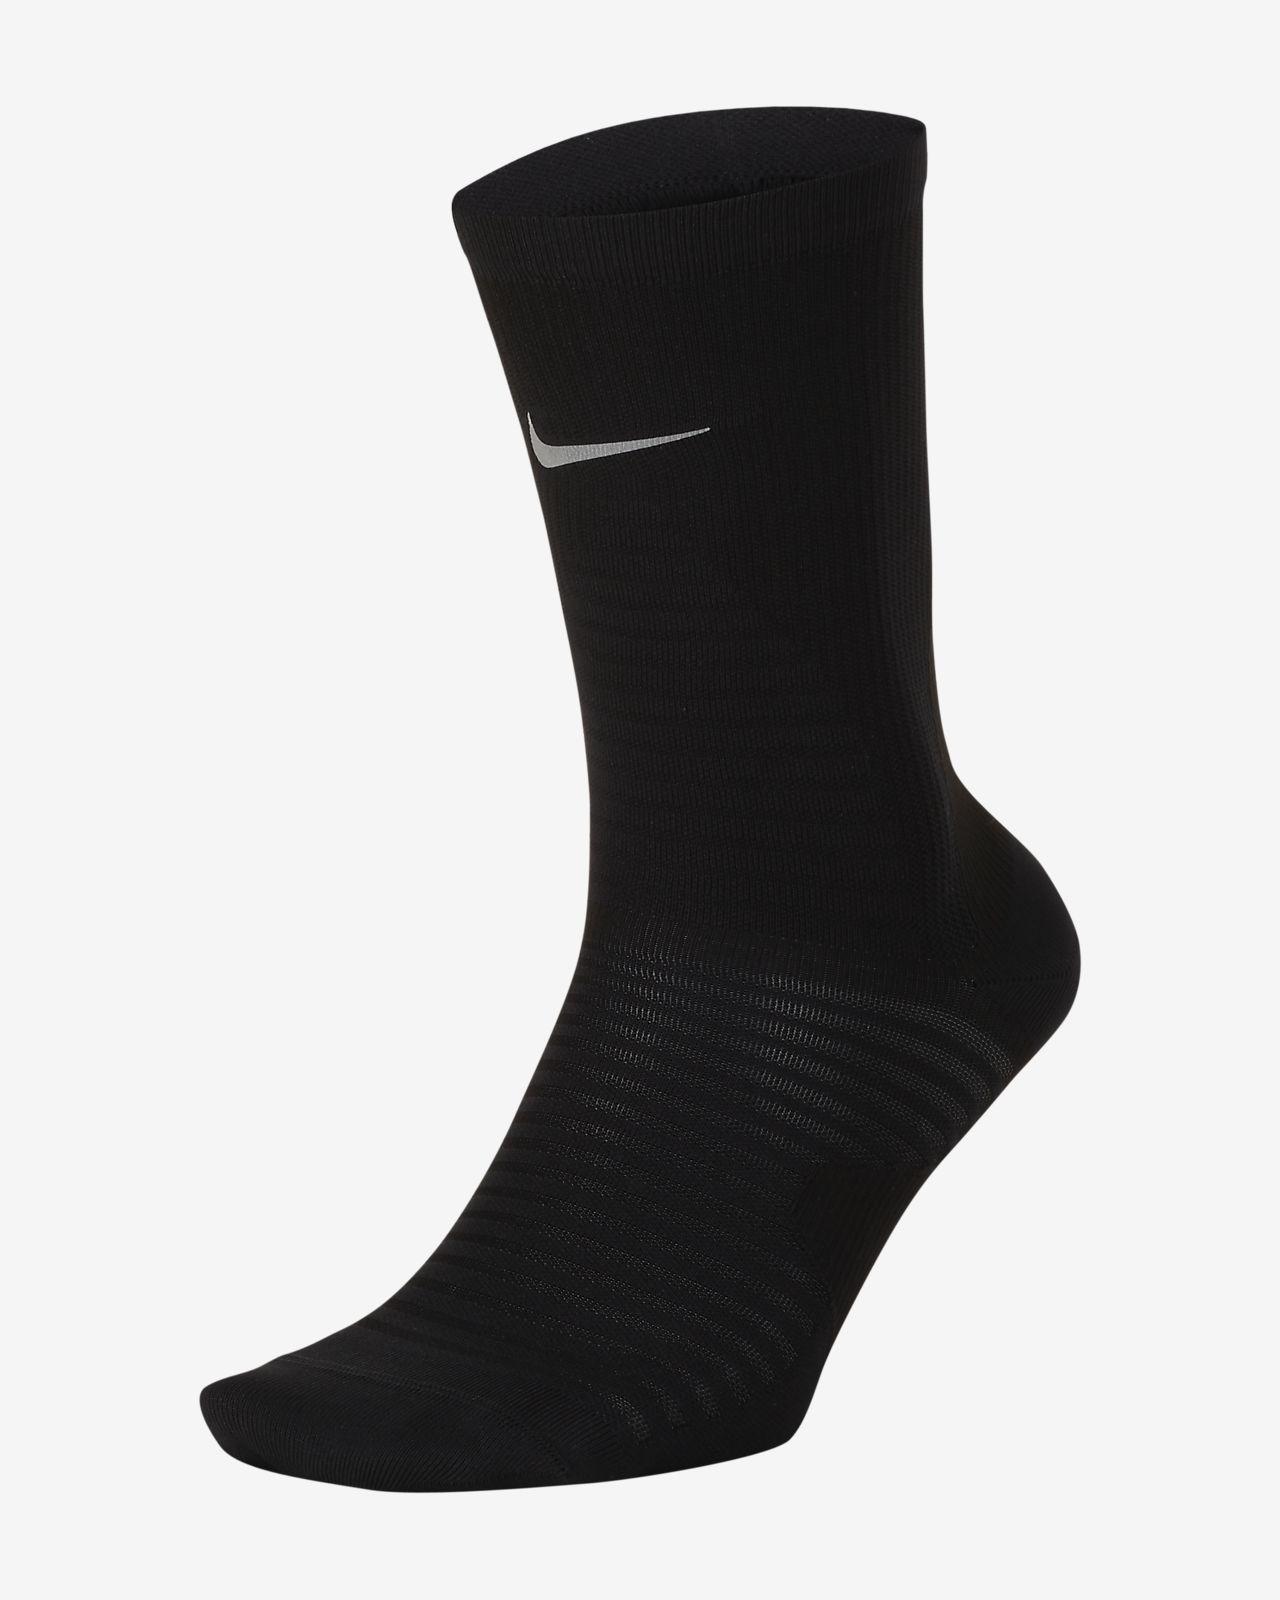 Nike Spark Lightweight Crew Running Socks